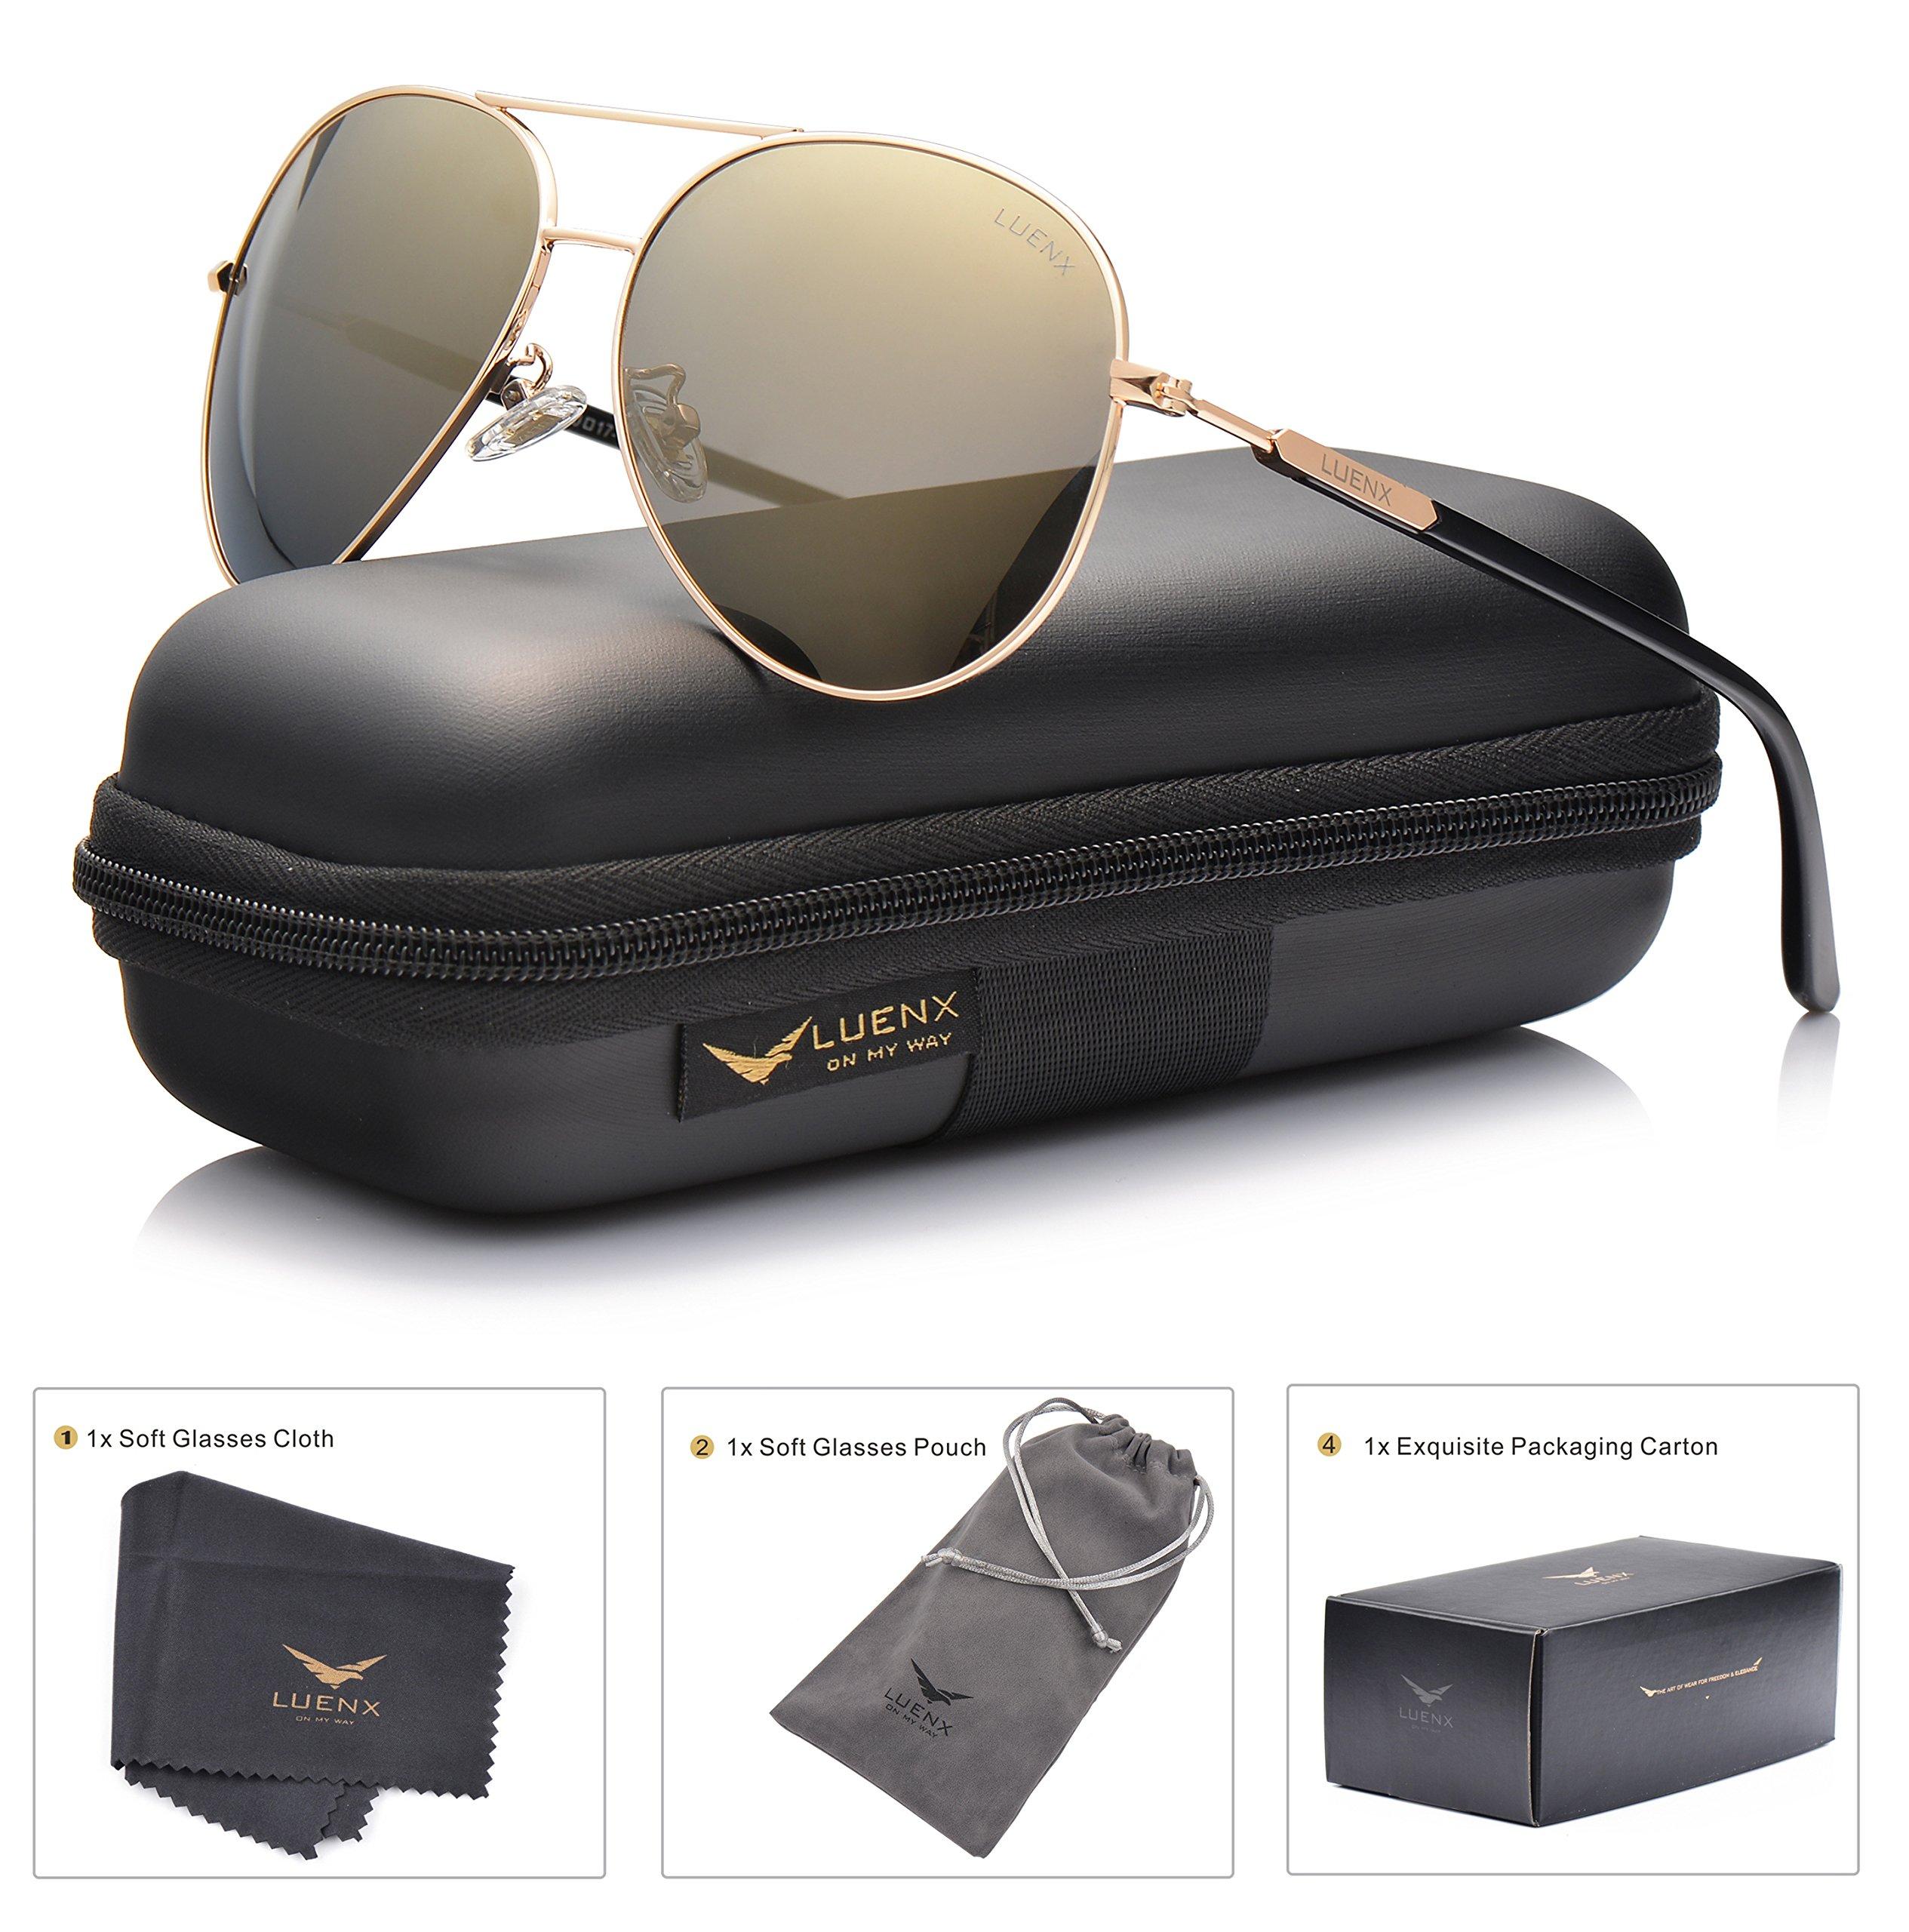 LUENX Aviator Sunglasses Women Men Polarized Mirrored Gold Lens Gold Metal Frame Large 60mm